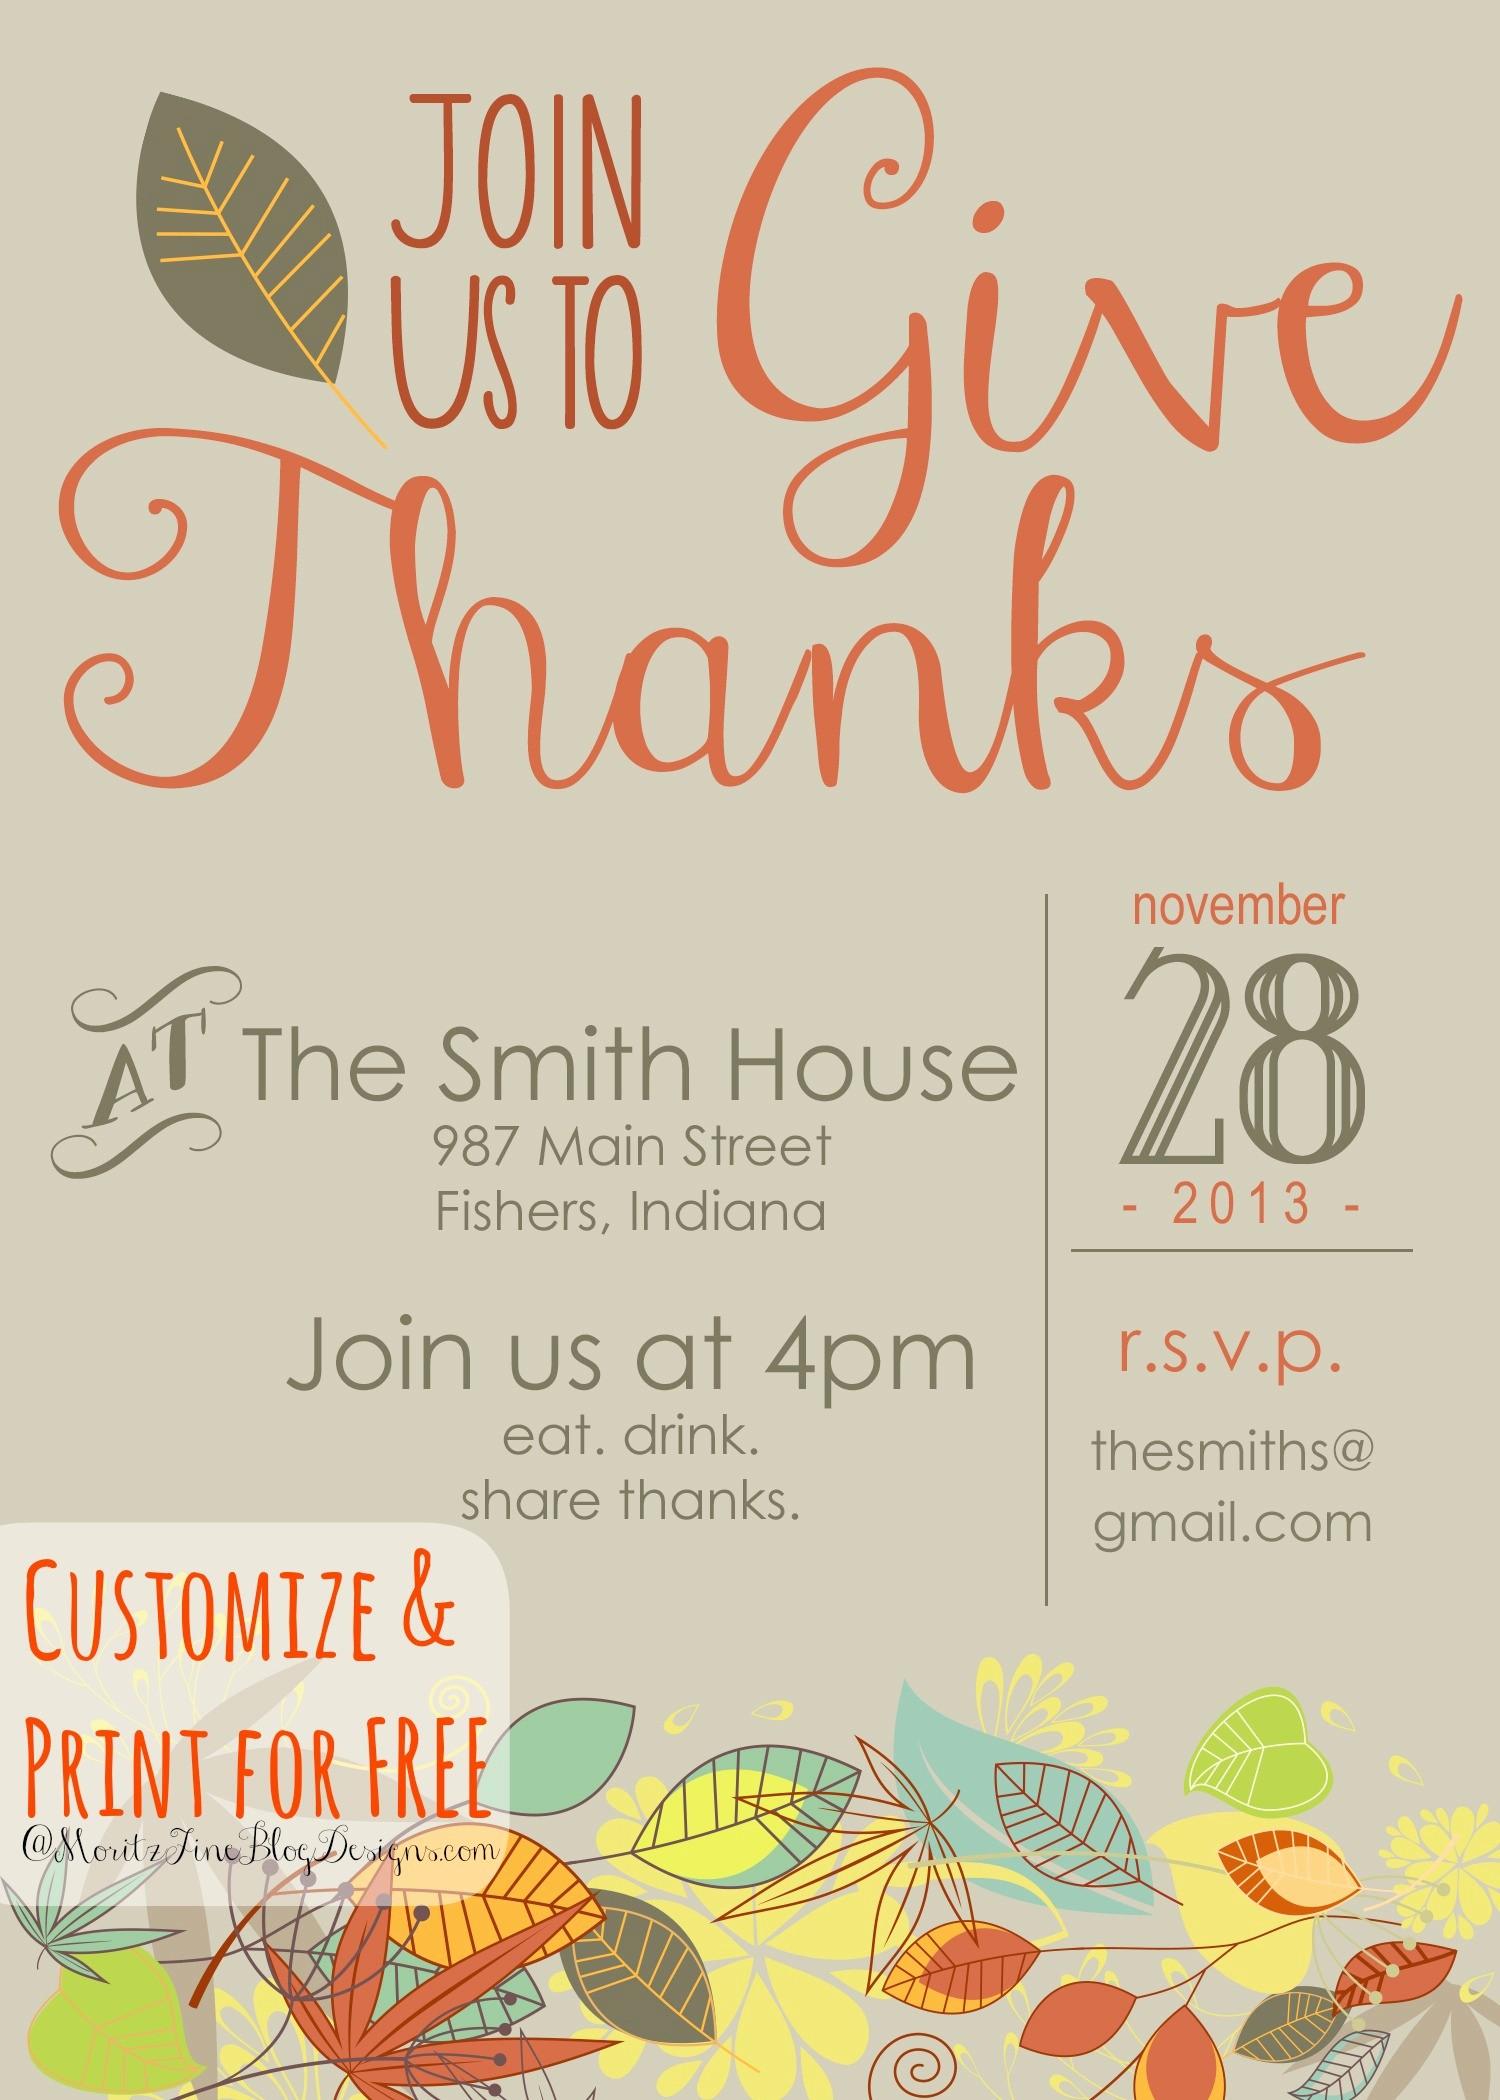 Potluck Invitation Template Free Printable Unique Free Thanksgiving Dinner Invitations Templates – Happy